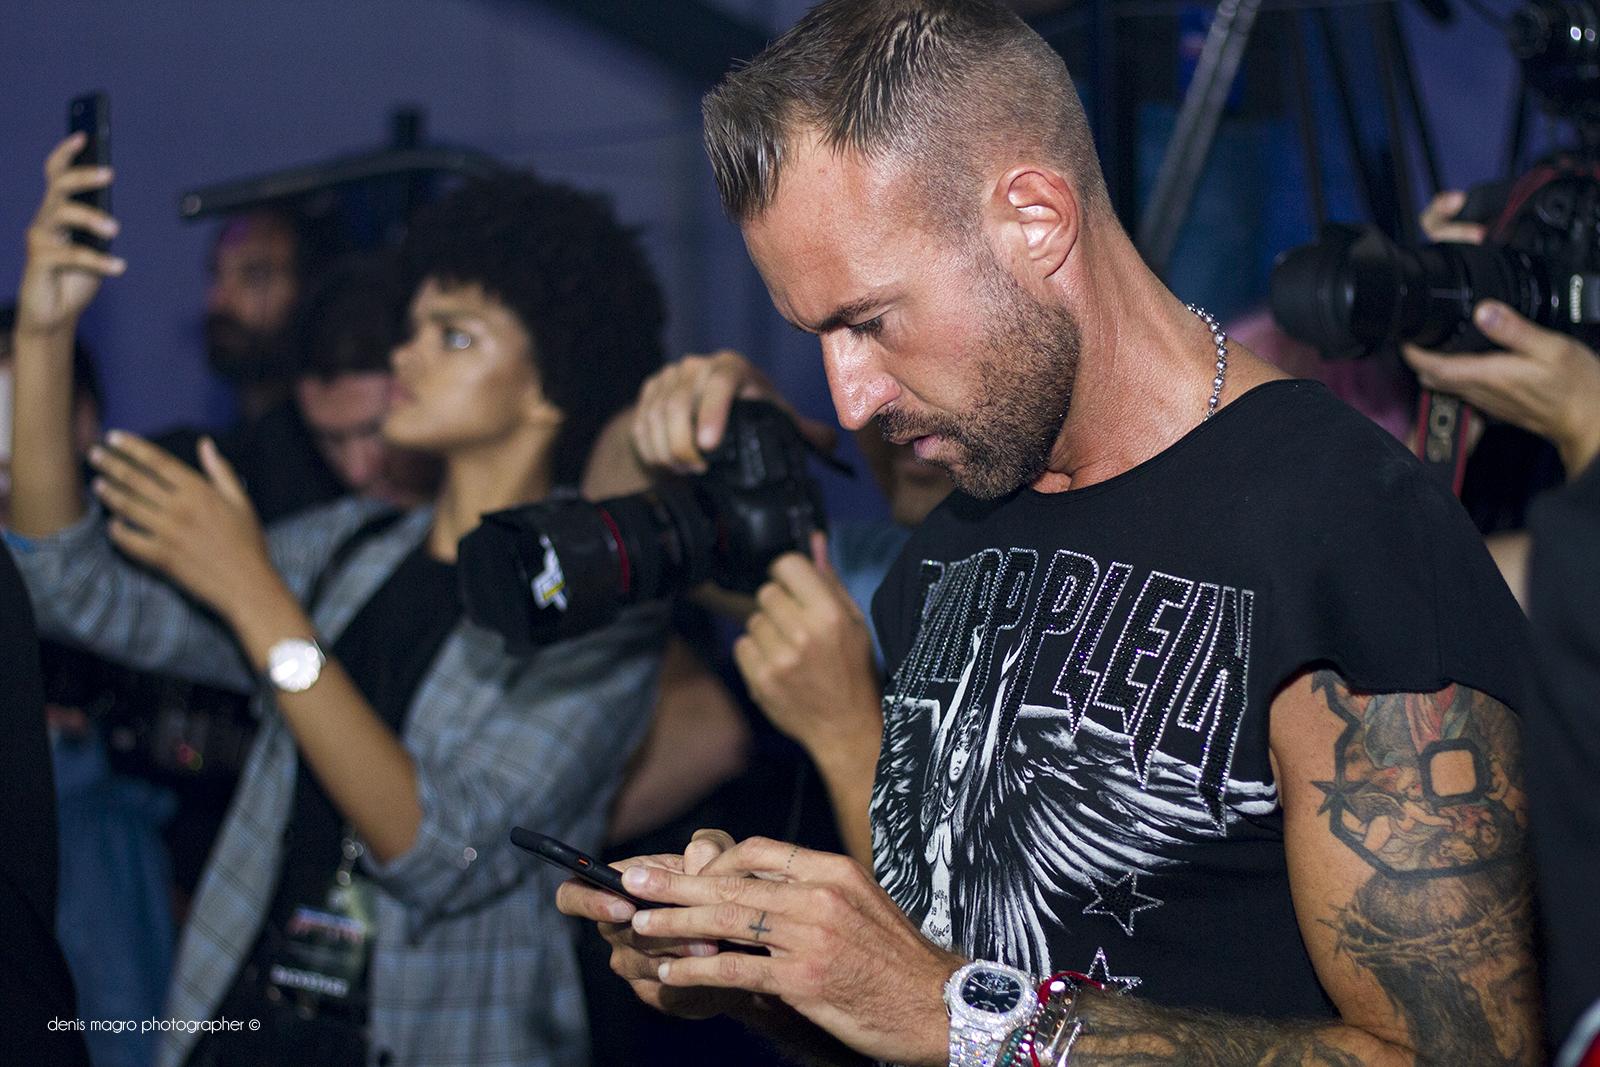 Philipp Plein / Denis Magro